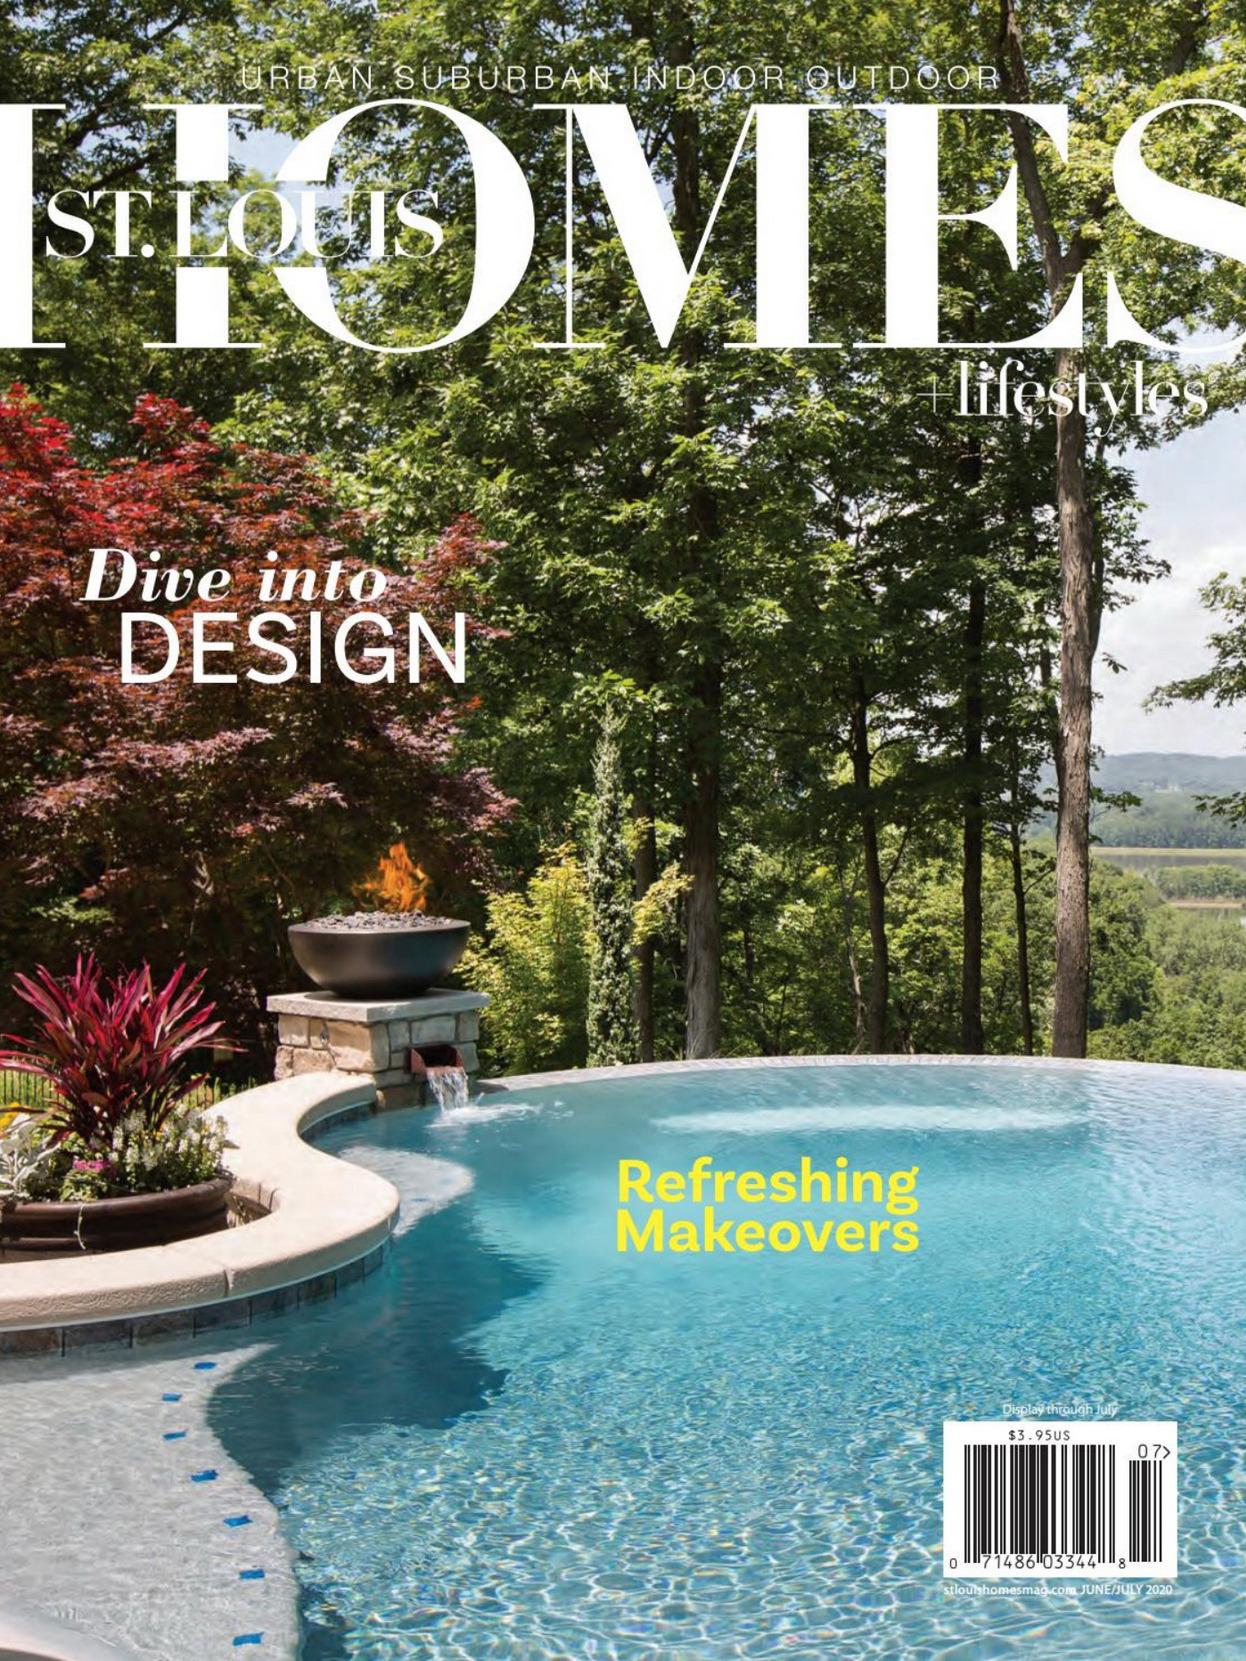 《St. Louis Homes & Lifestyles》美国版时尚家居生活杂志2020年07月号